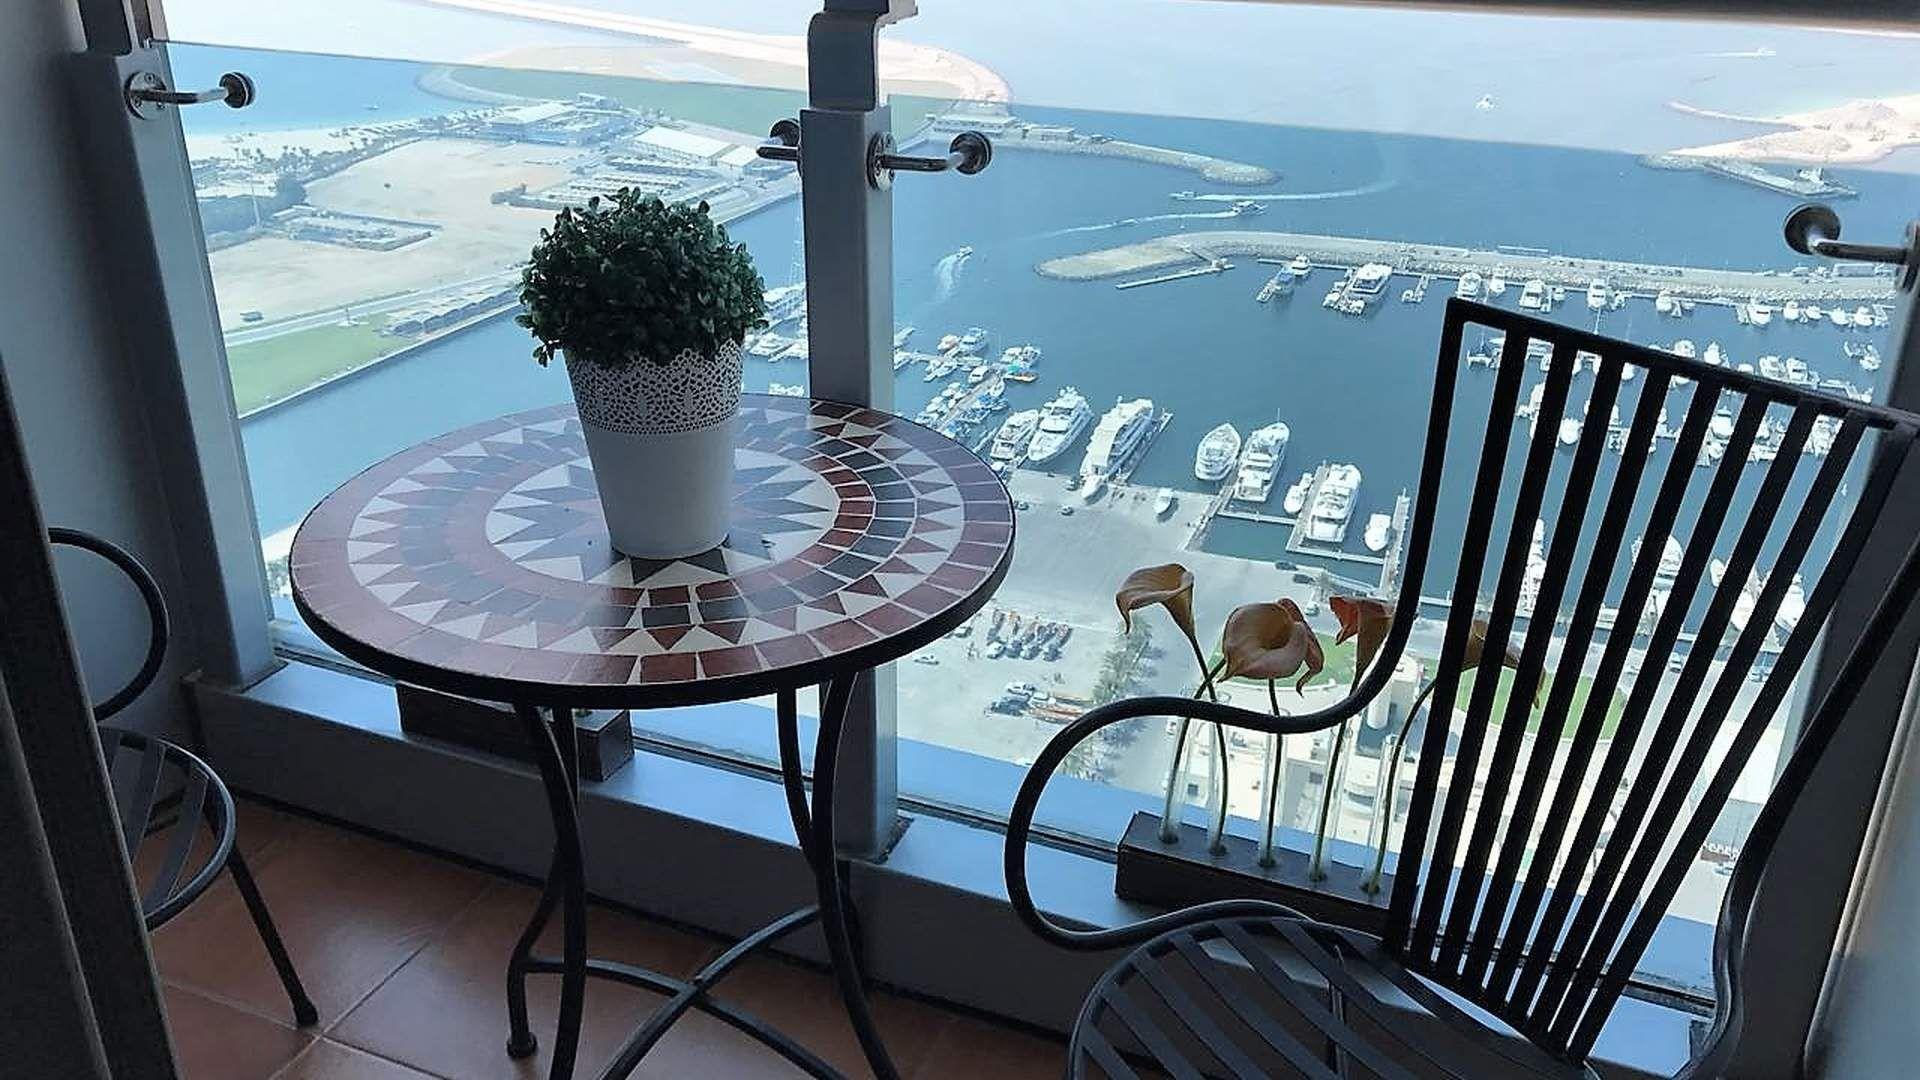 #Dubaimarina #Dubai #LuxuryProperty #Apartment | Dubai ...